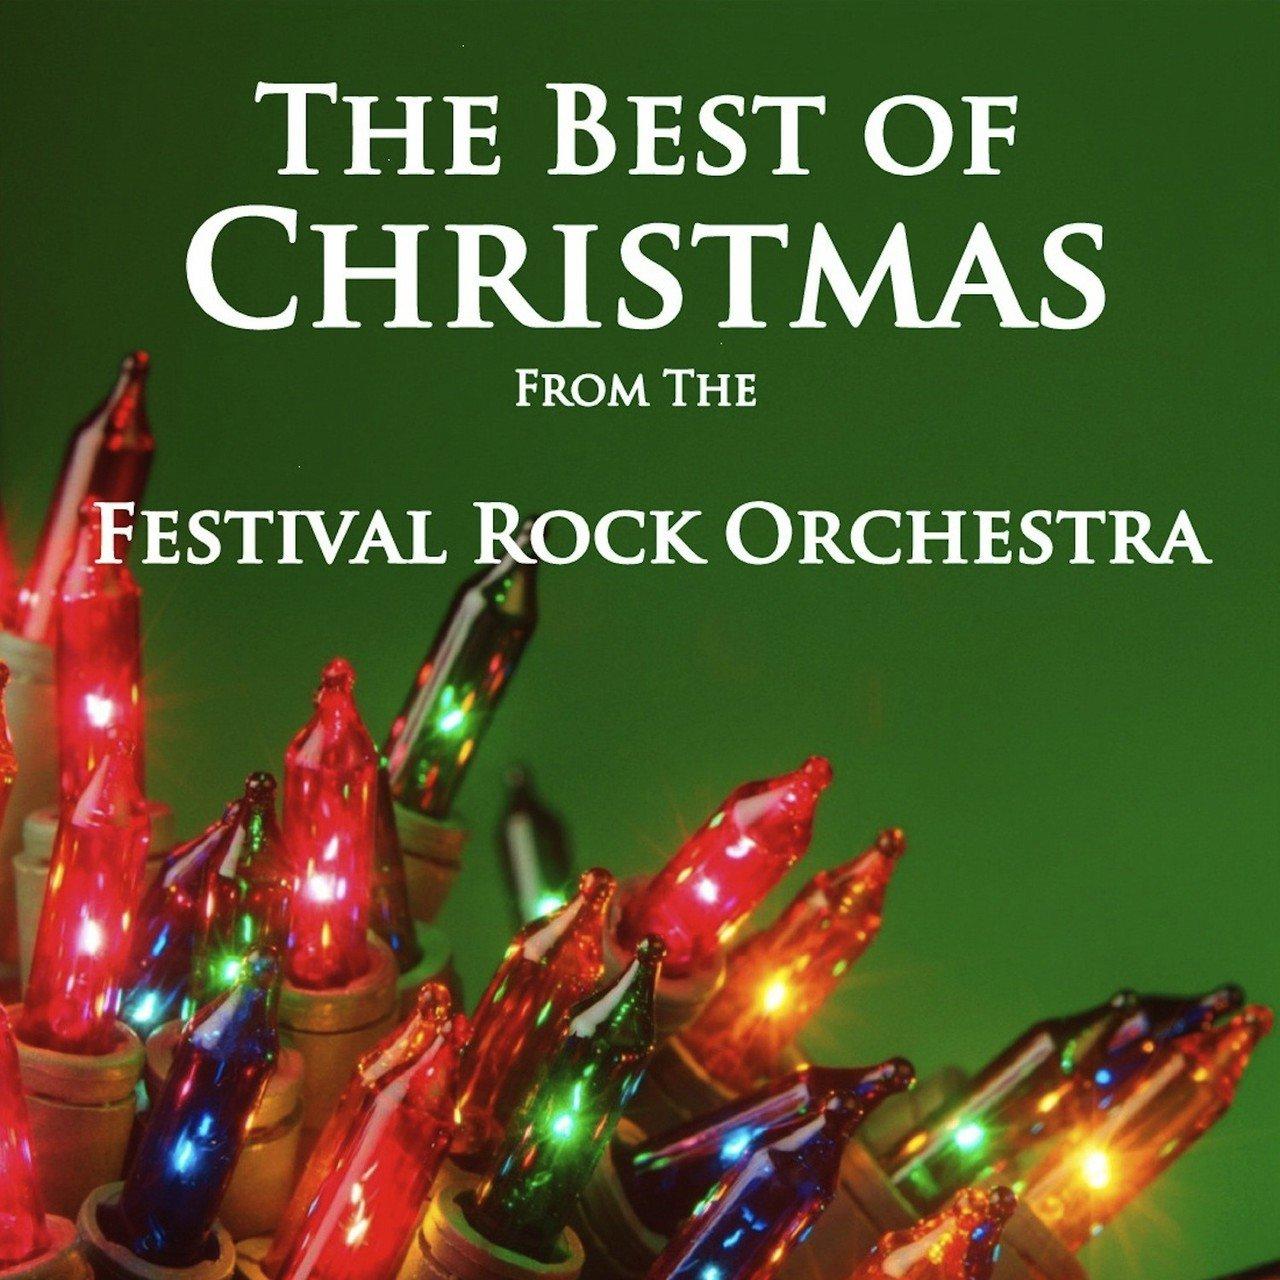 TIDAL: Listen to The Best of Christmas on TIDAL